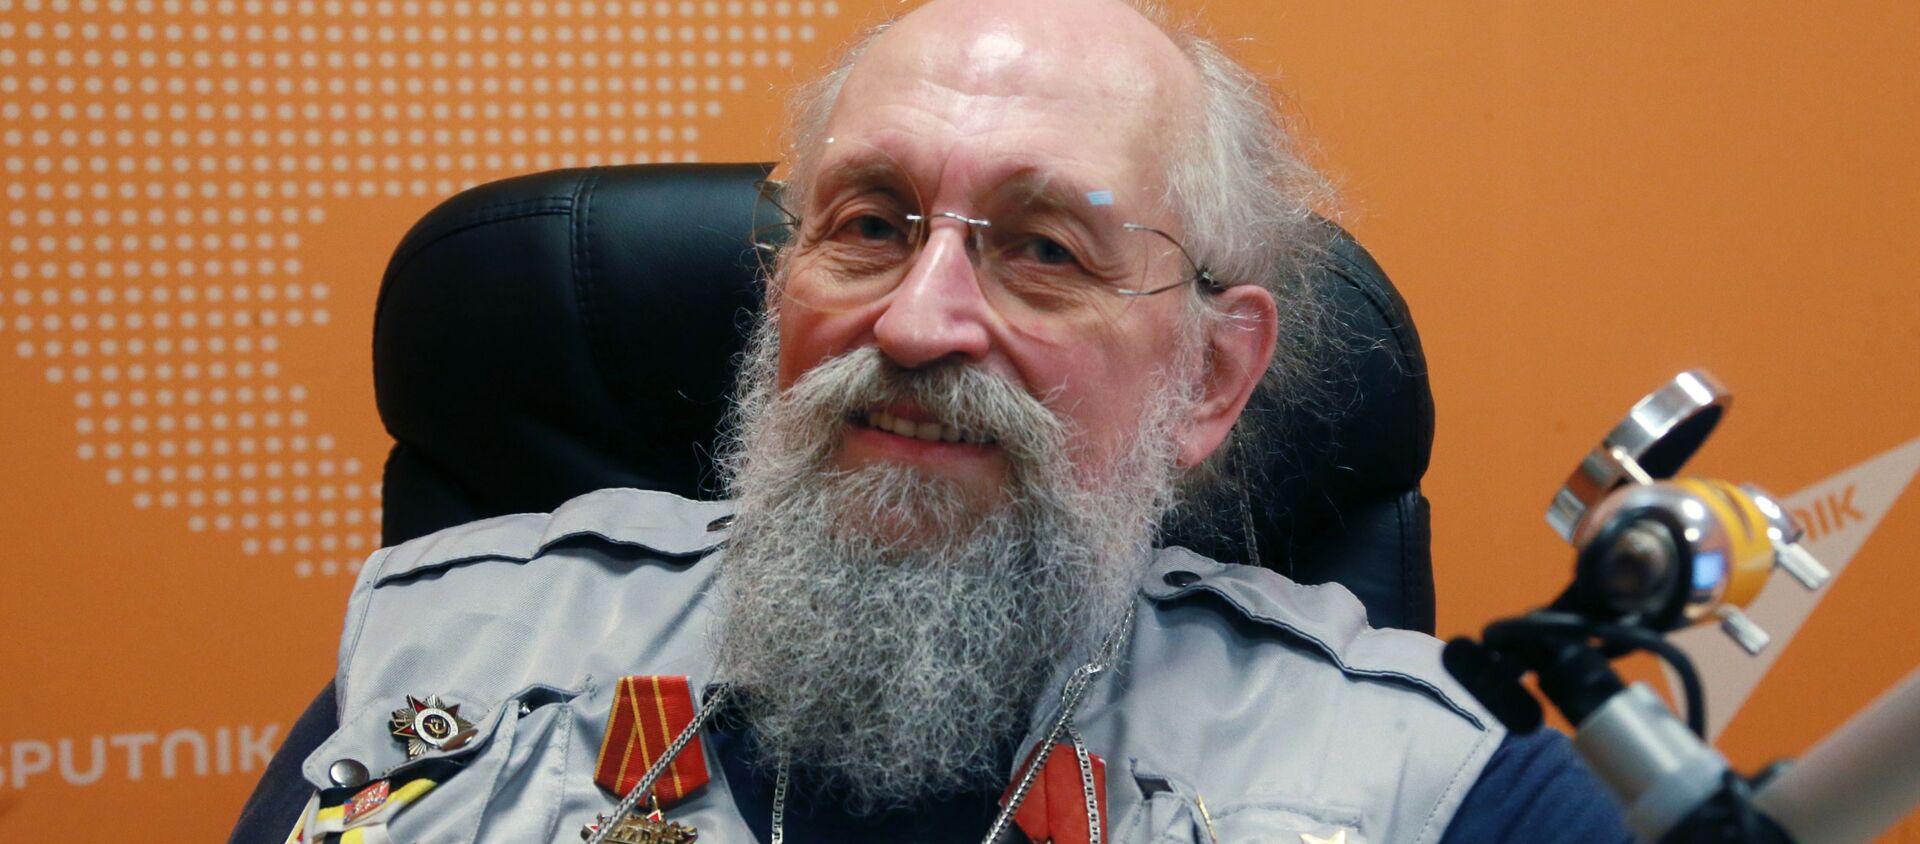 Журналист, телеведущий, публицист Анатолий Вассерман - Sputnik Беларусь, 1920, 18.02.2021